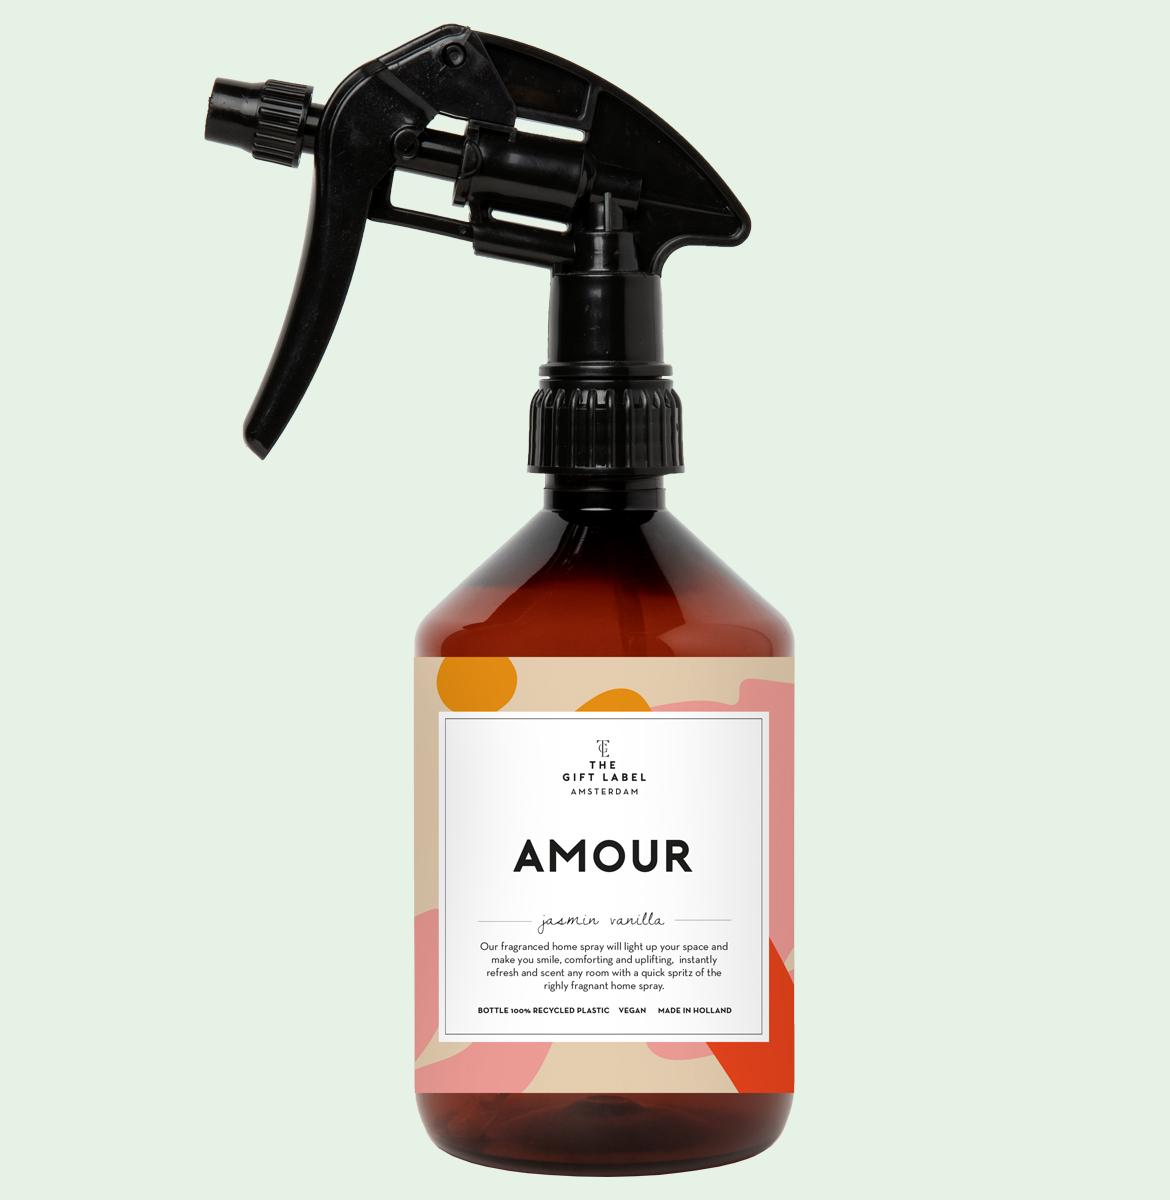 GiftLabel Homespray Amour - Stylin cadeau artikelen Rijnsburg